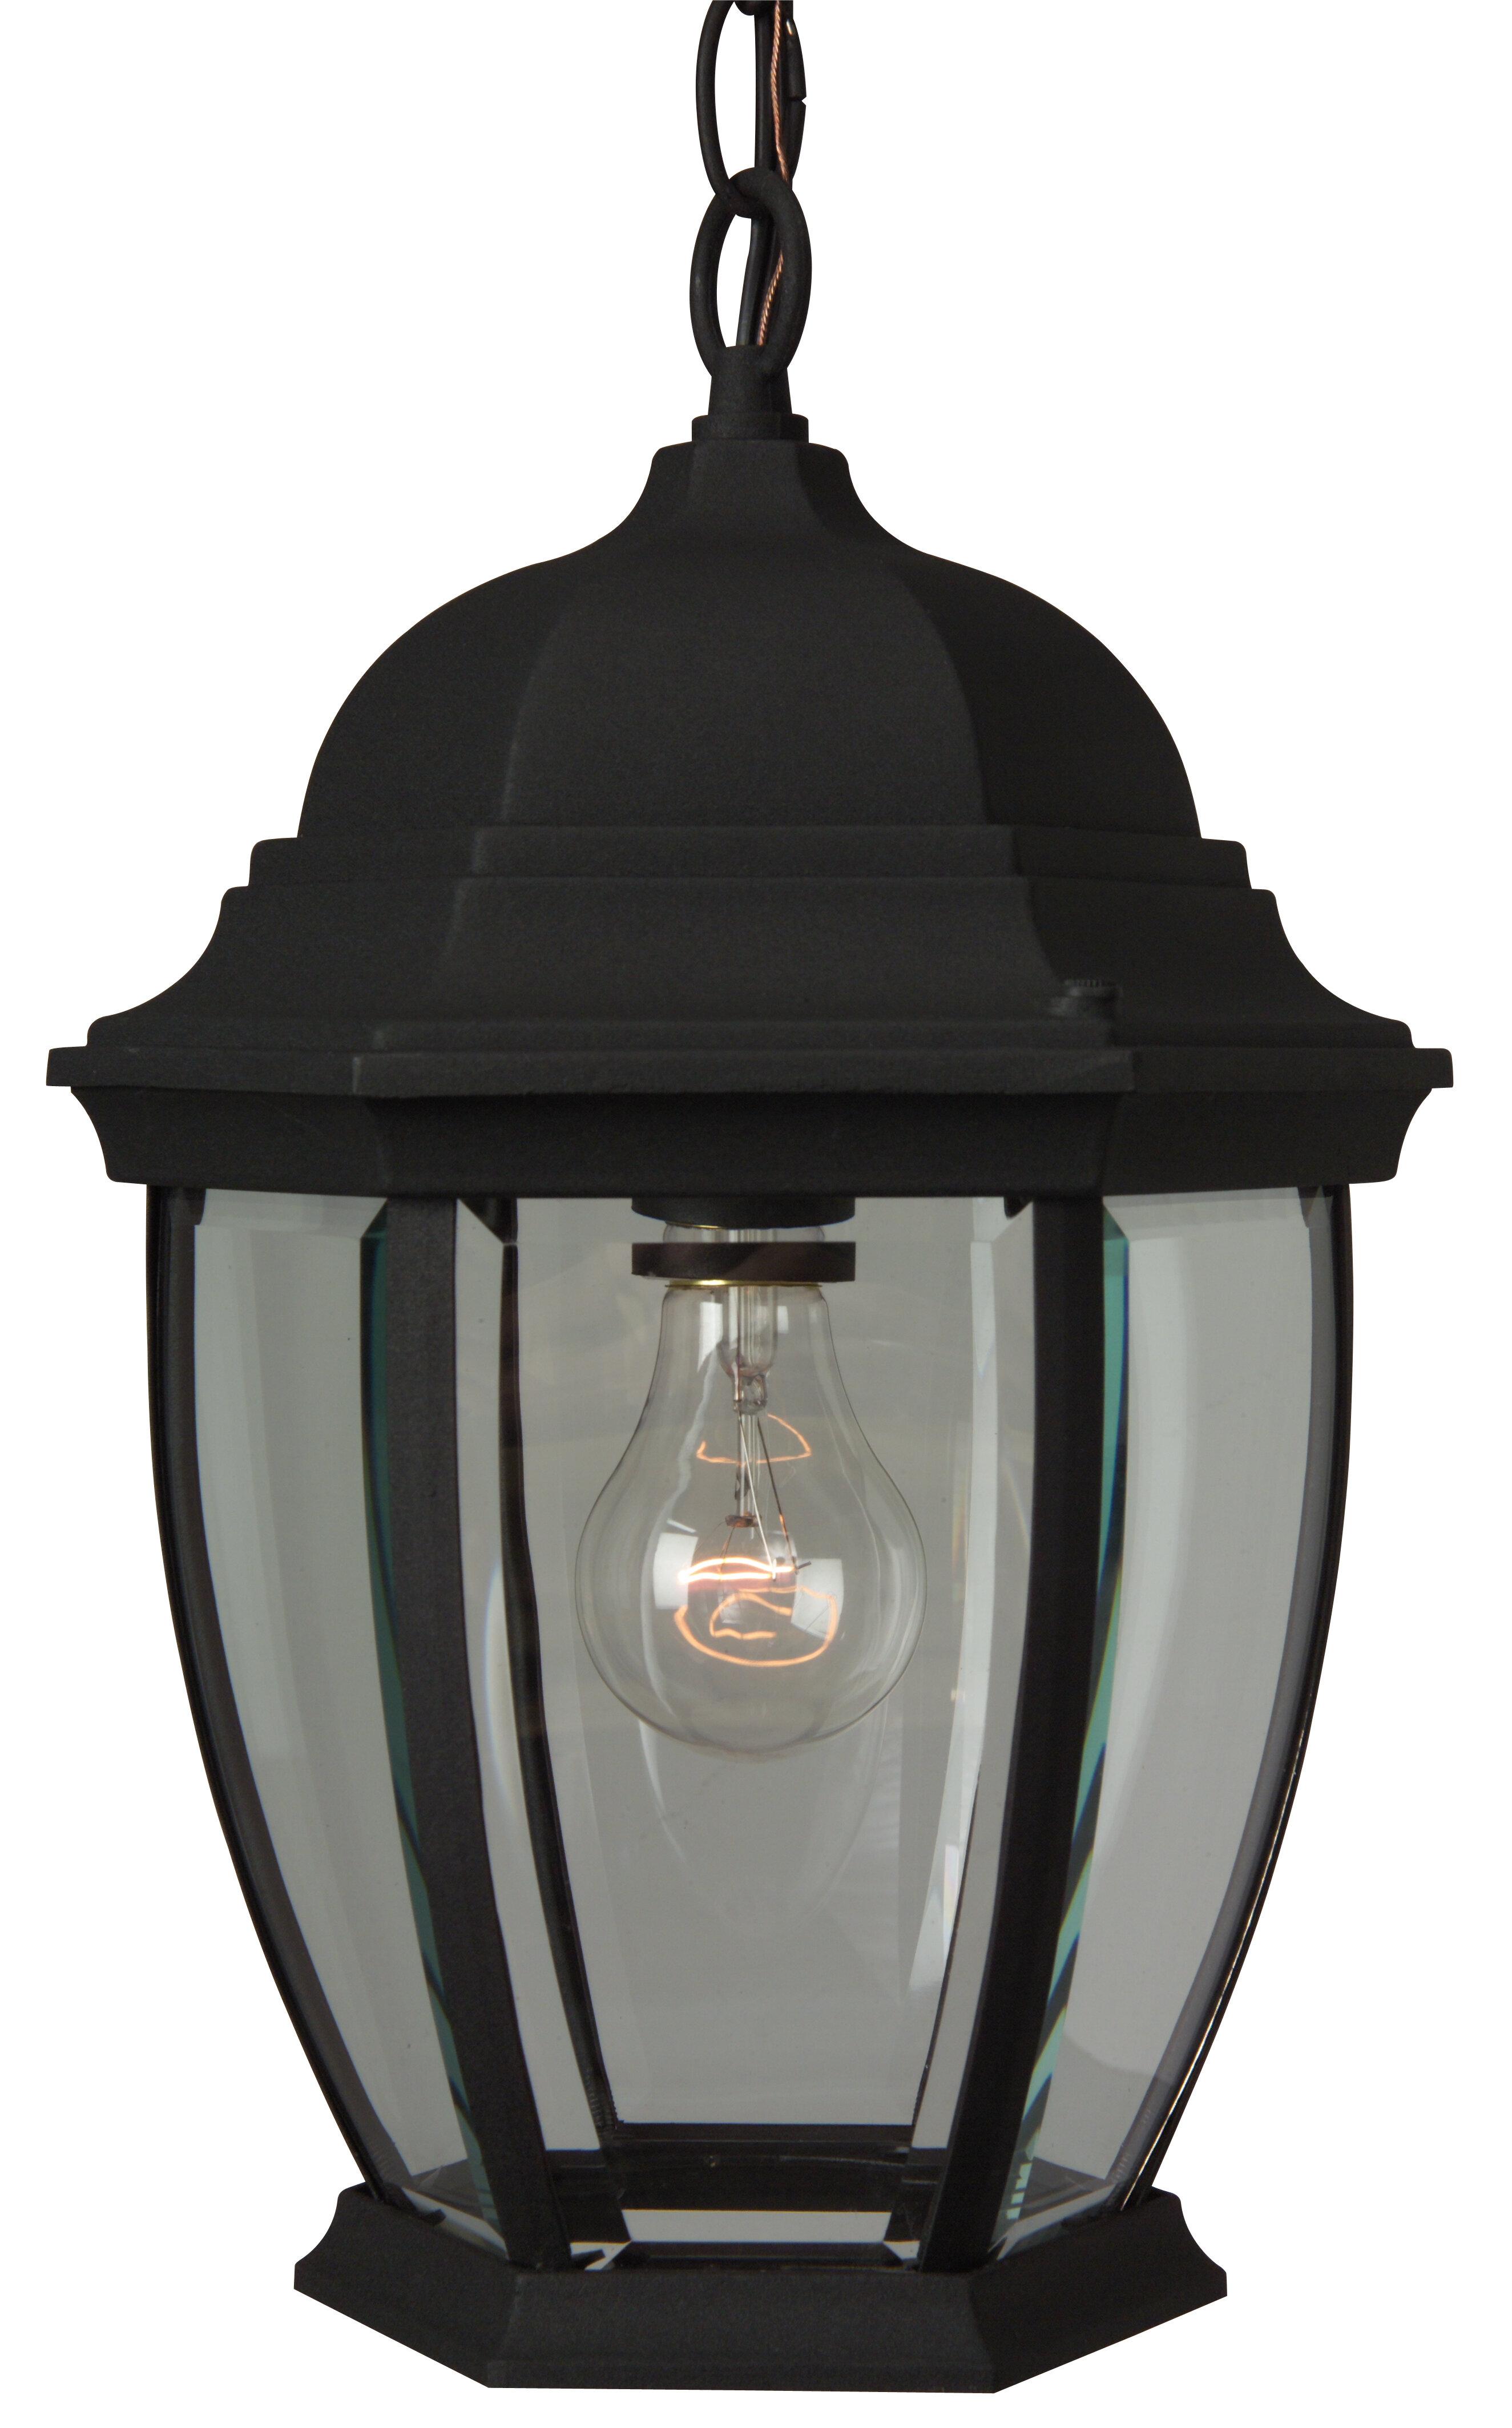 Breakwater Bay Frederica 1 Bulb 14 5 H Outdoor Hanging Lantern Reviews Wayfair